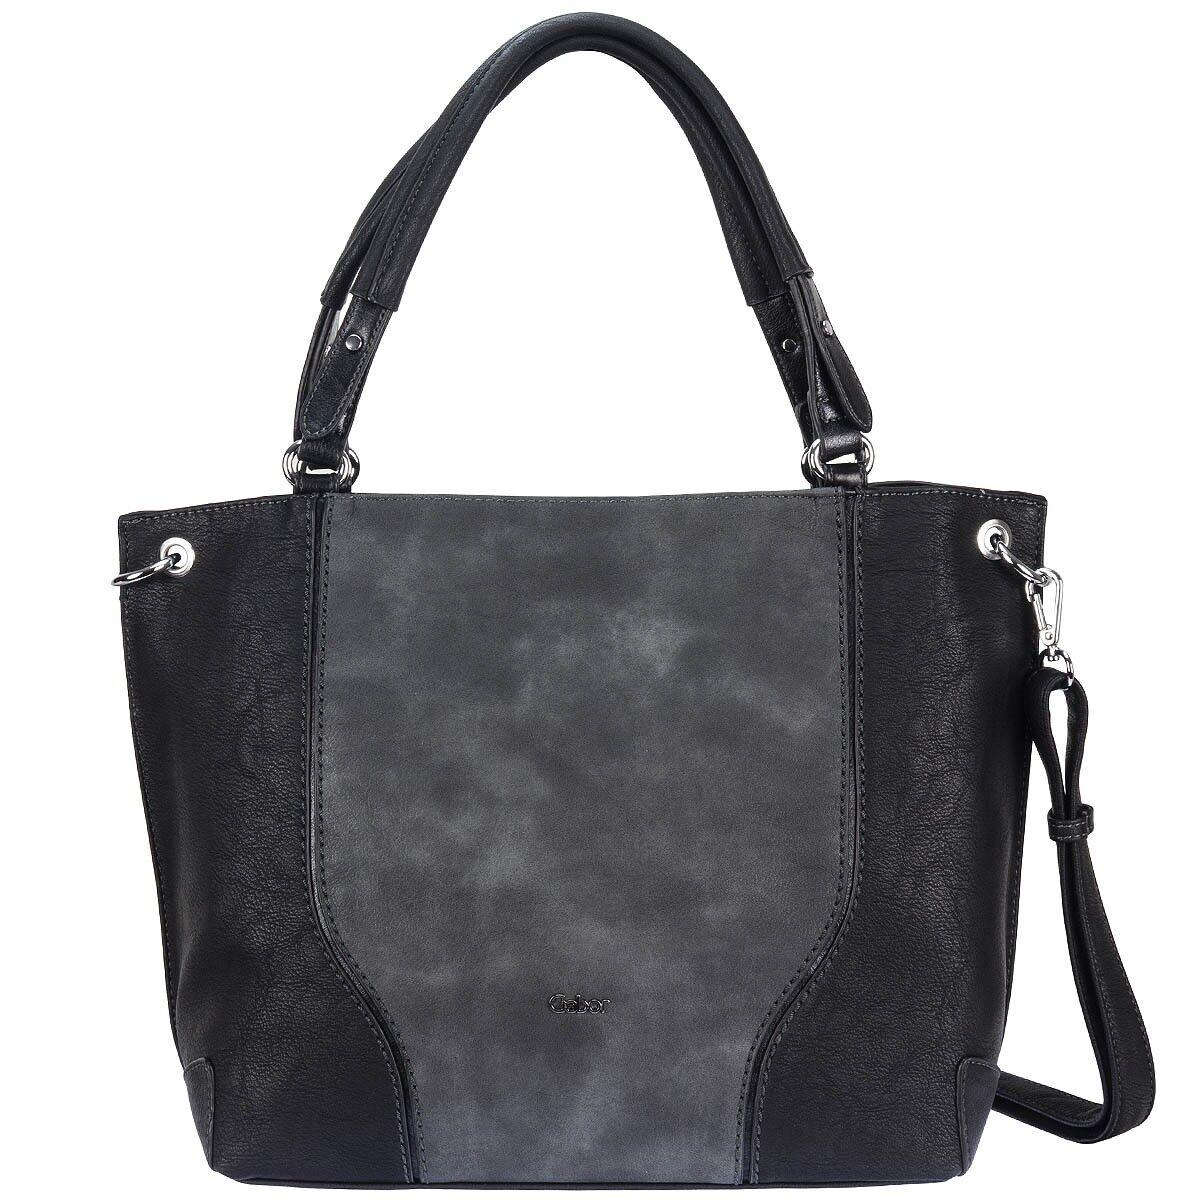 Gabor Treviso Damen Shopper Handtasche Henkeltasche Schultertasche Handbag Handbag Handbag 7659 | eine große Vielfalt  e72862